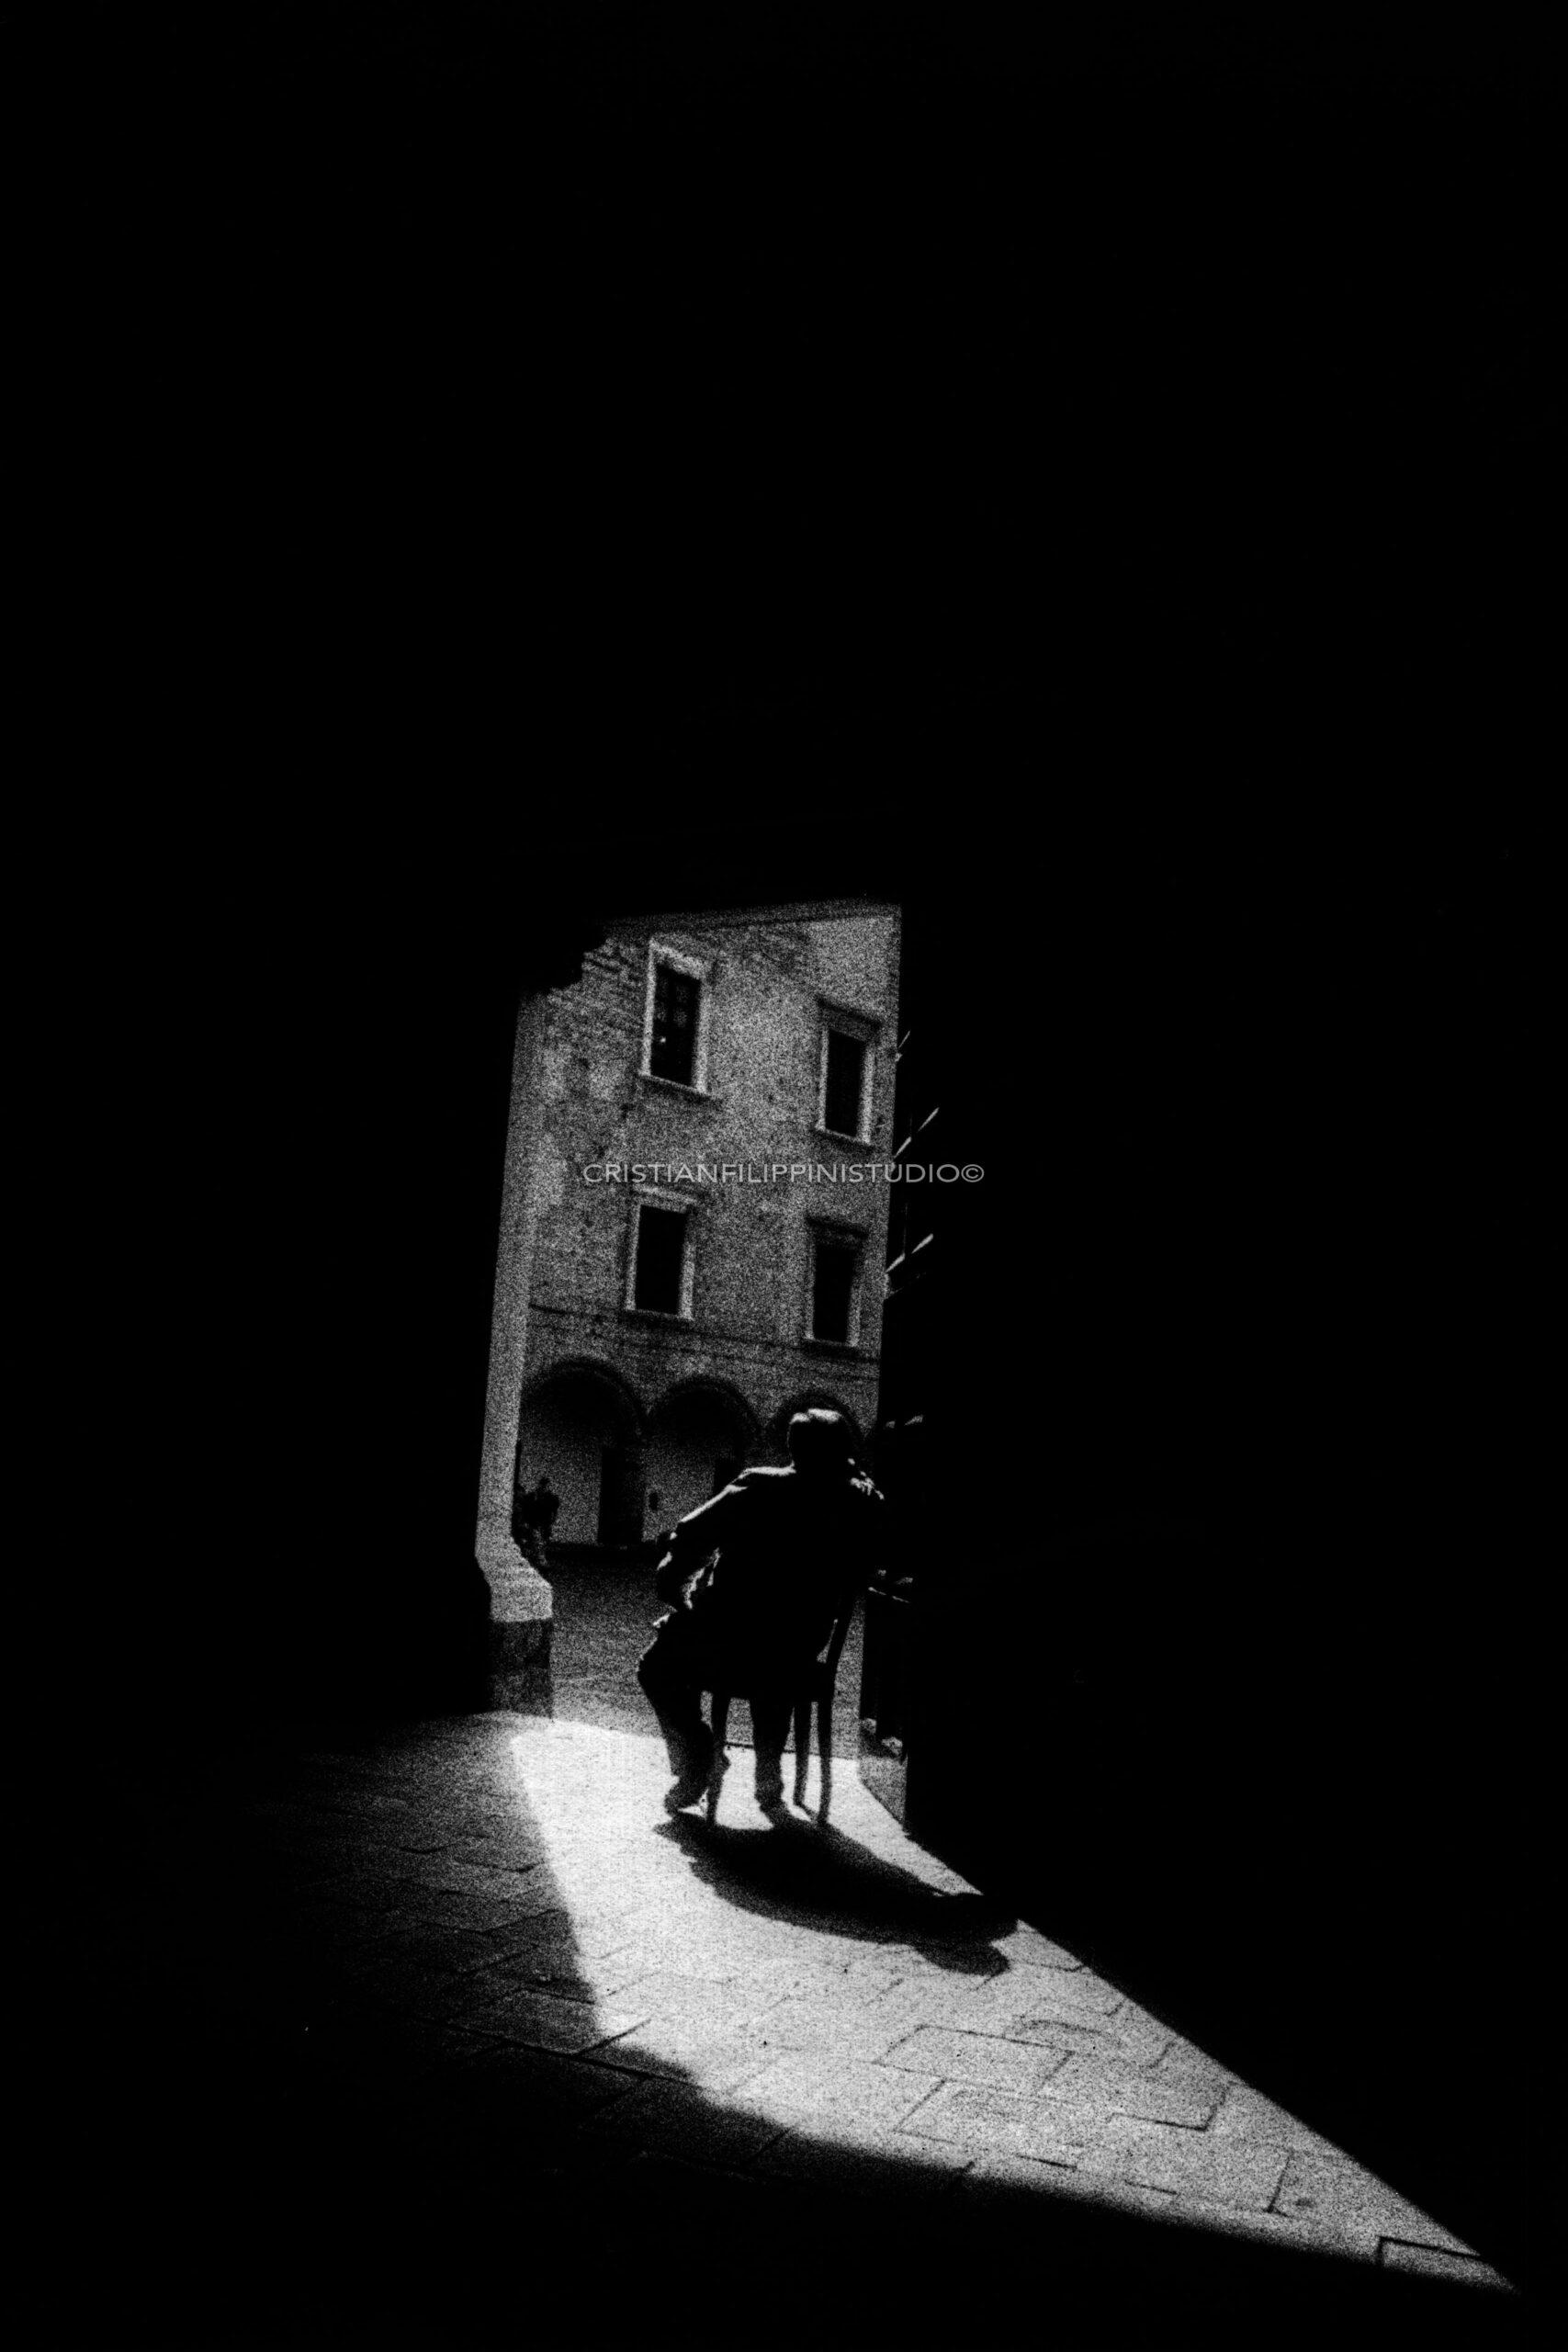 Napoli Italy   Cristian Filippini Studio © Fine Art Photography Video & Advertising